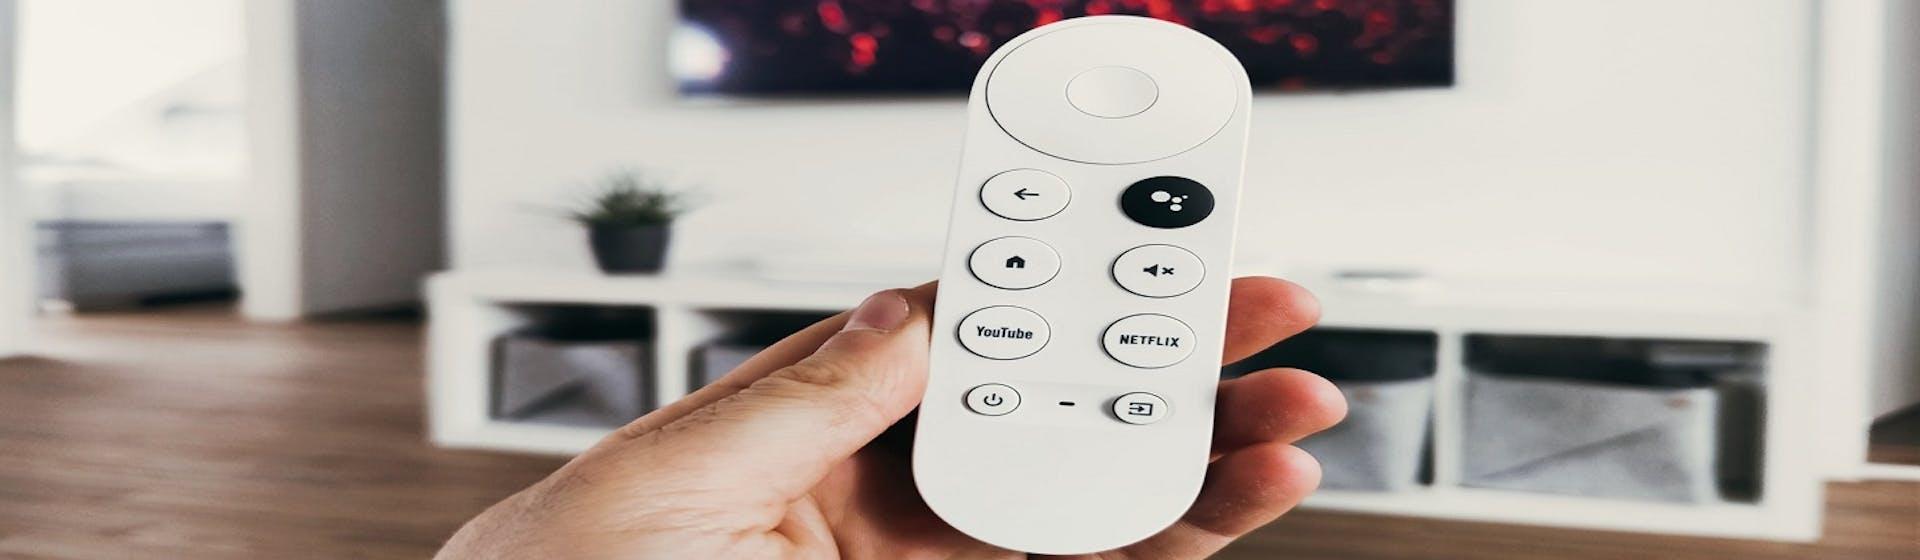 Chromecast: ¡Lleva tus dispositivos analógicos a la era Smart!